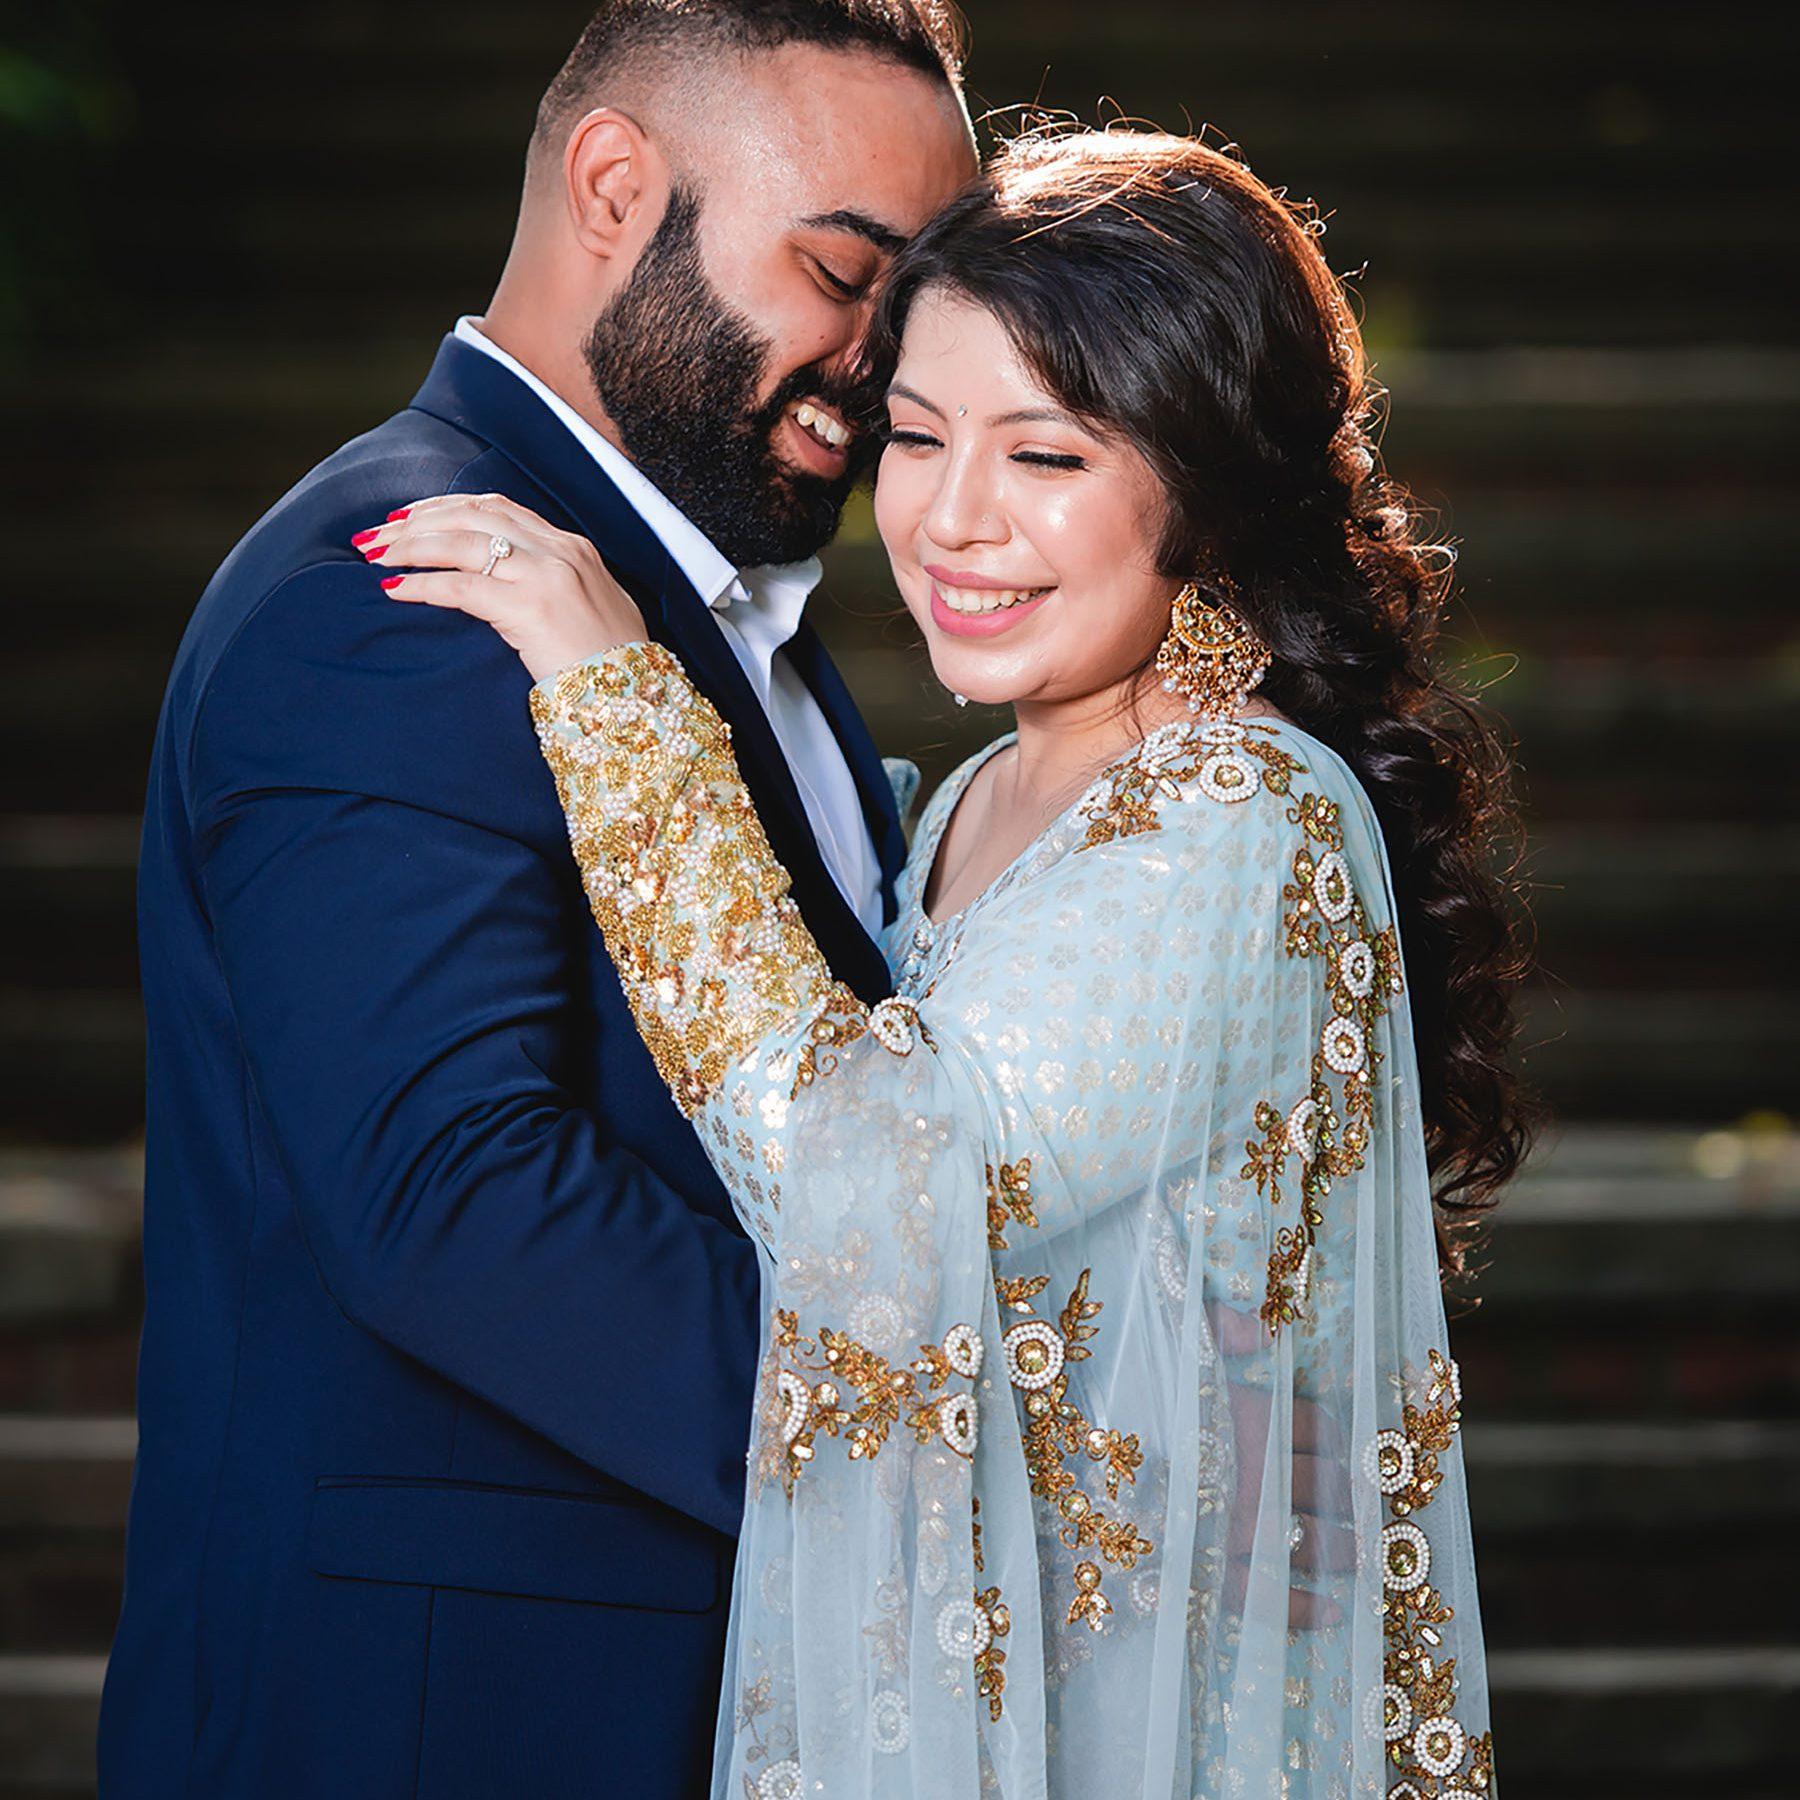 Pre-Wedding-Photo-Shoot-Glen-Cove-1800x1800 Engagement